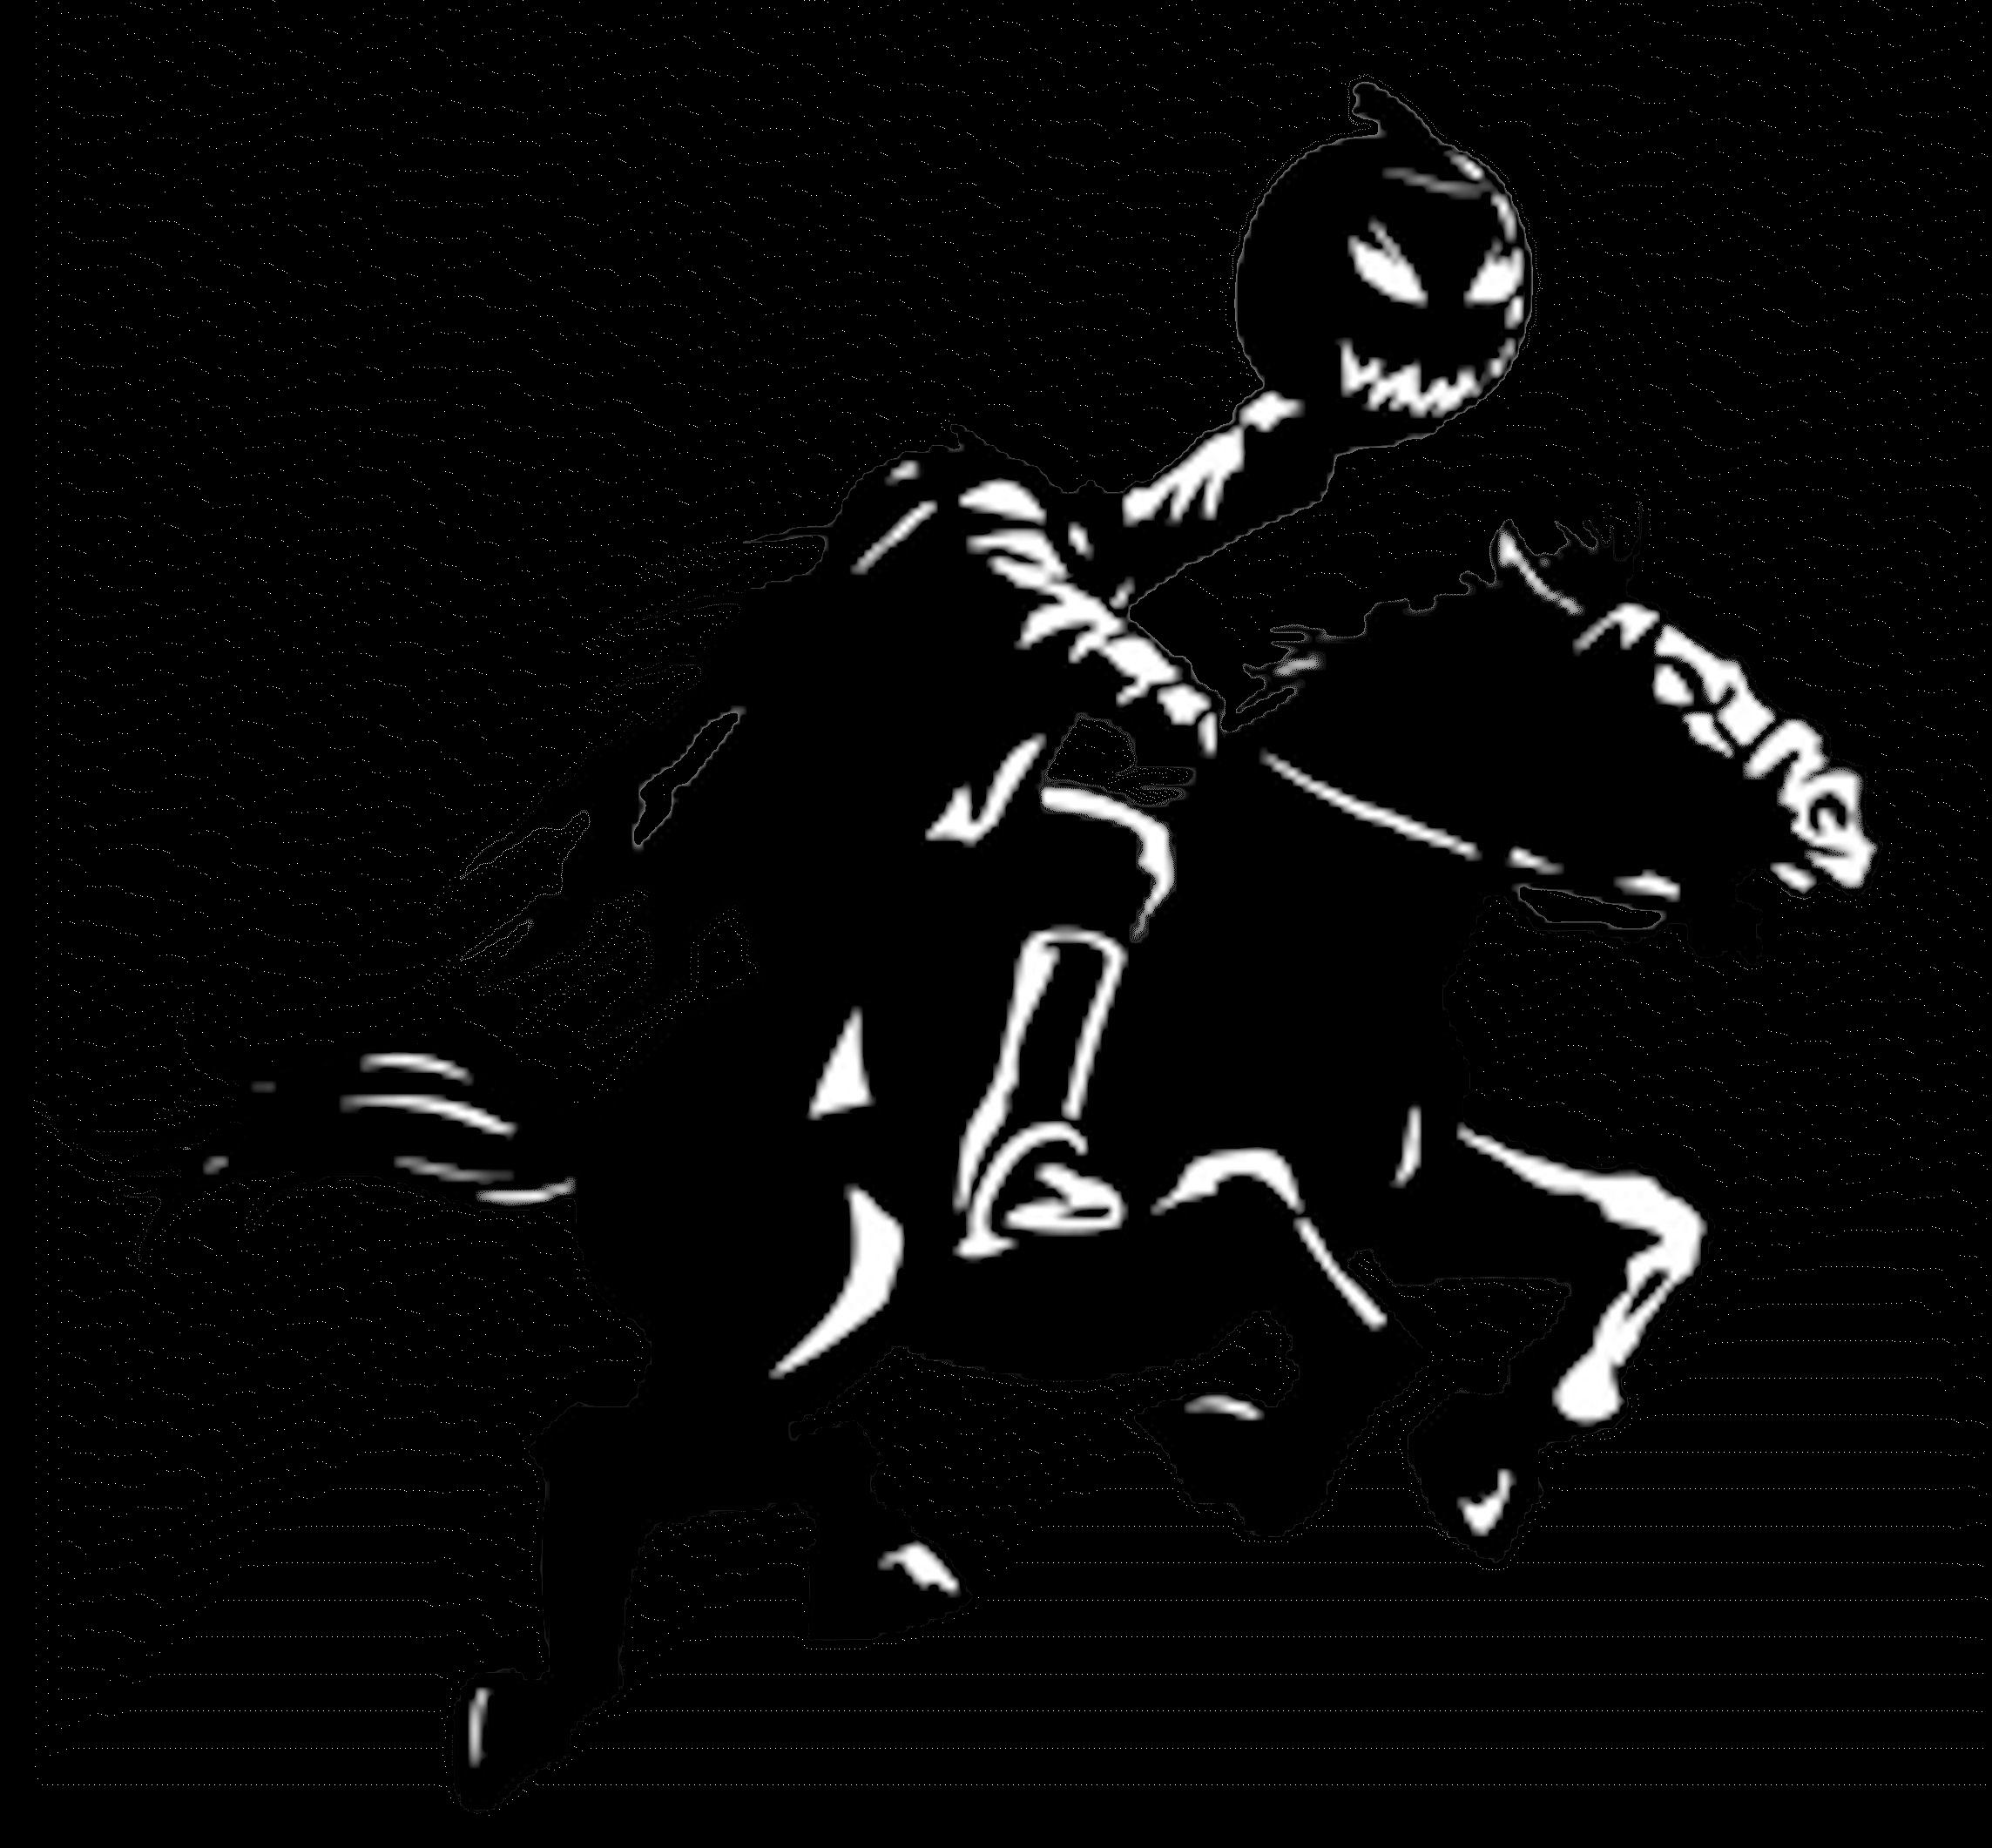 The Legend of Sleepy Hollow The Headless Horseman Pursuing.